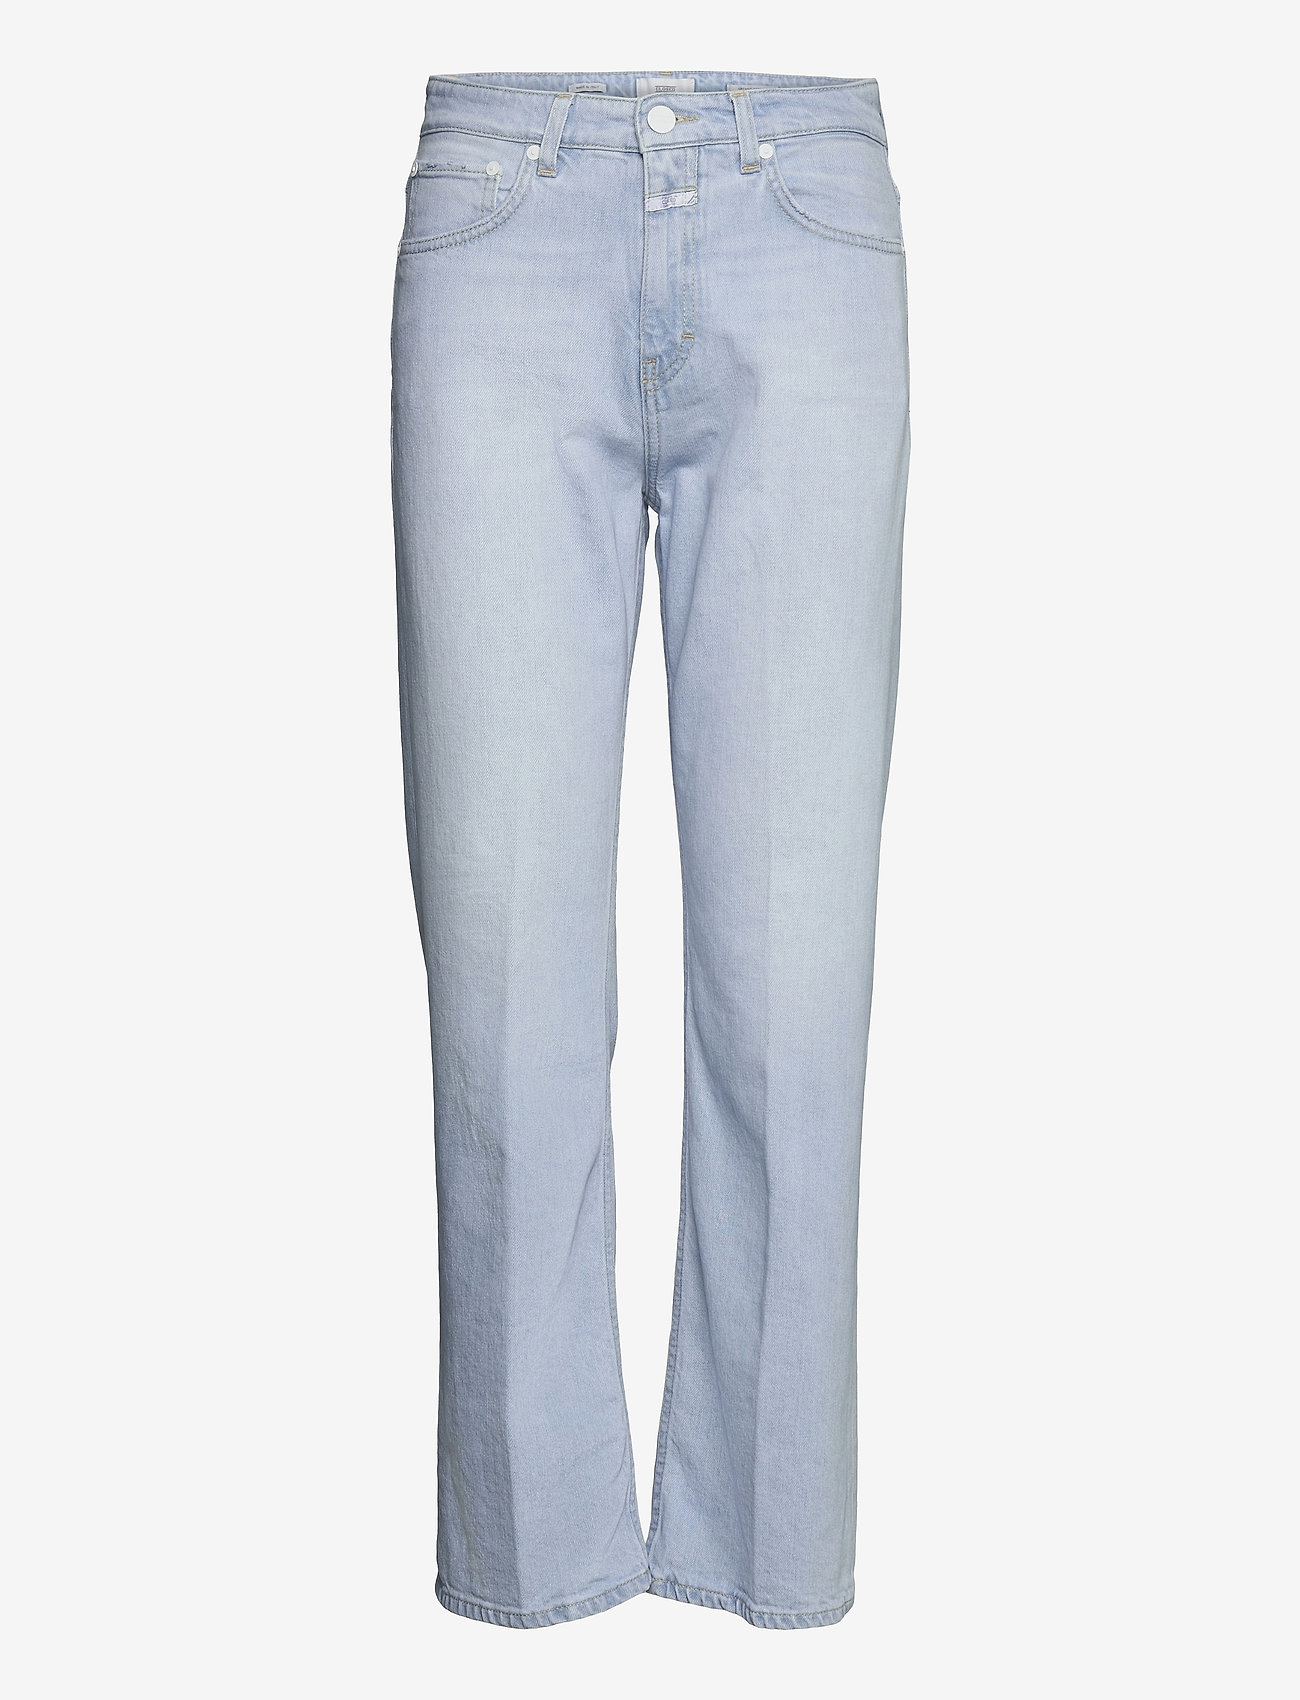 Closed - womens pant - straight regular - light blue - 0